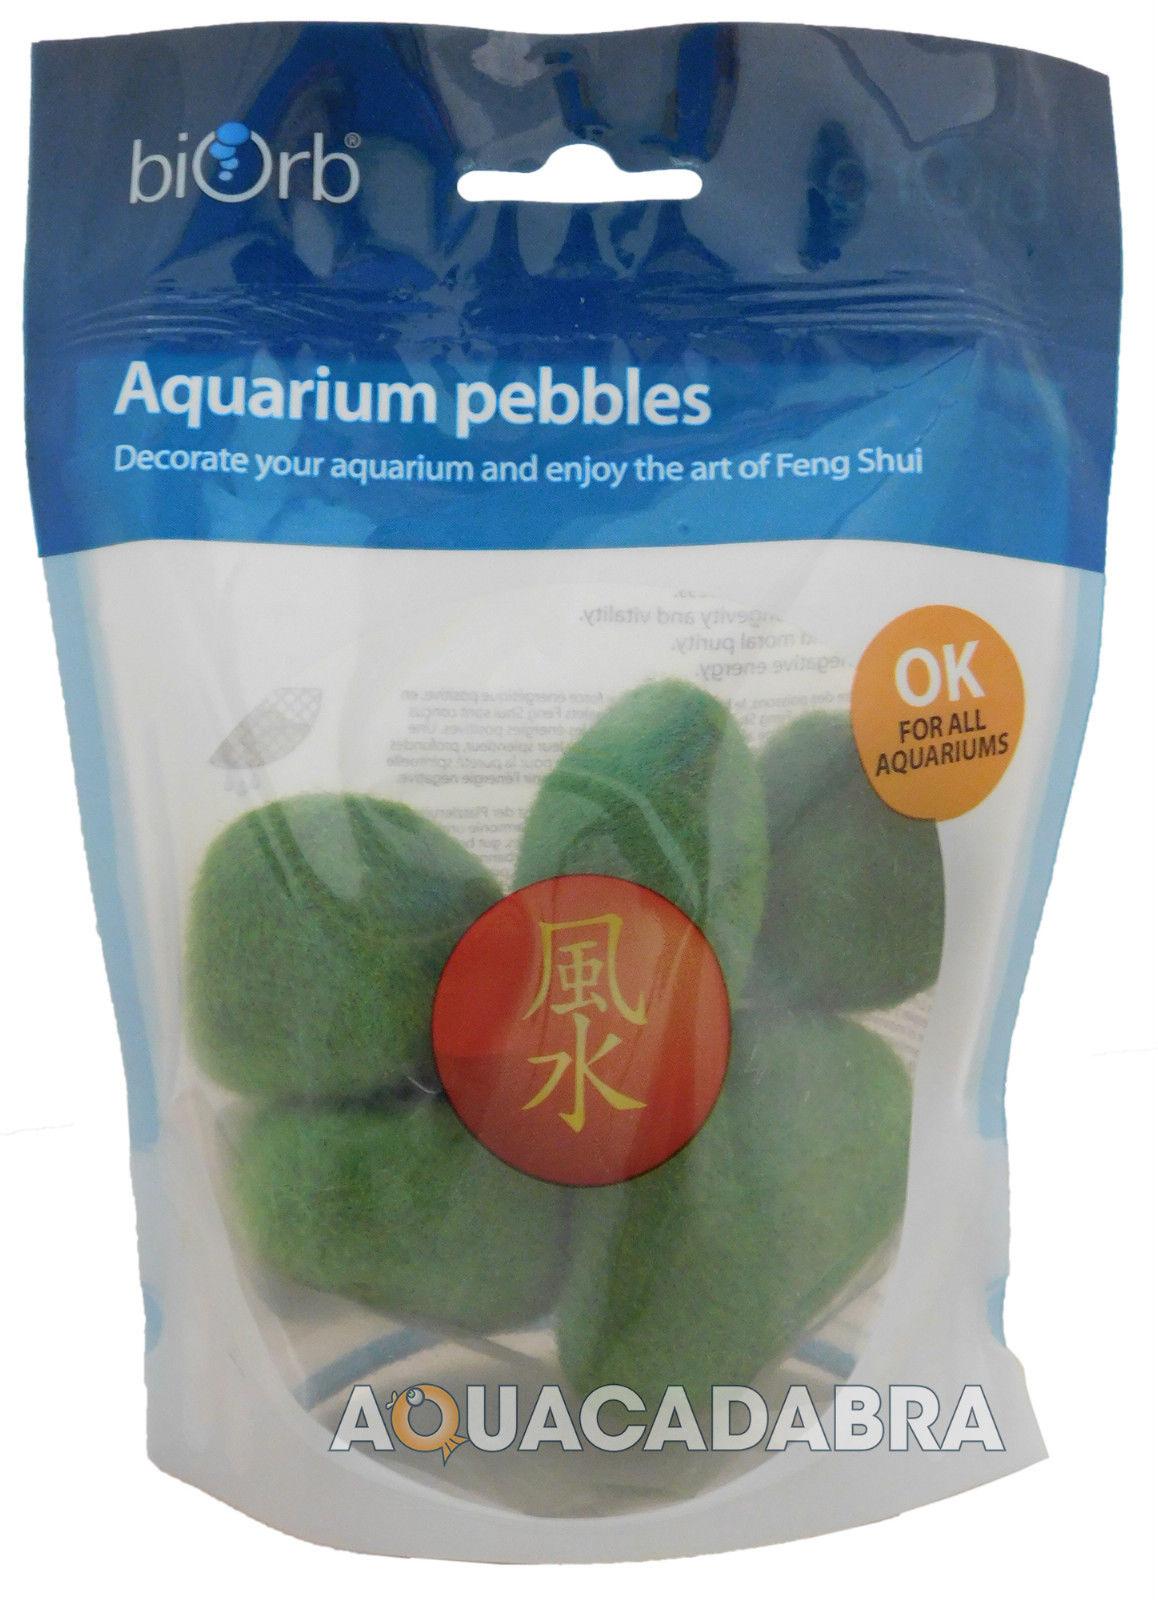 reef one biorb moss pebble pack green feng shui decoration aquarium fish tank ebay. Black Bedroom Furniture Sets. Home Design Ideas